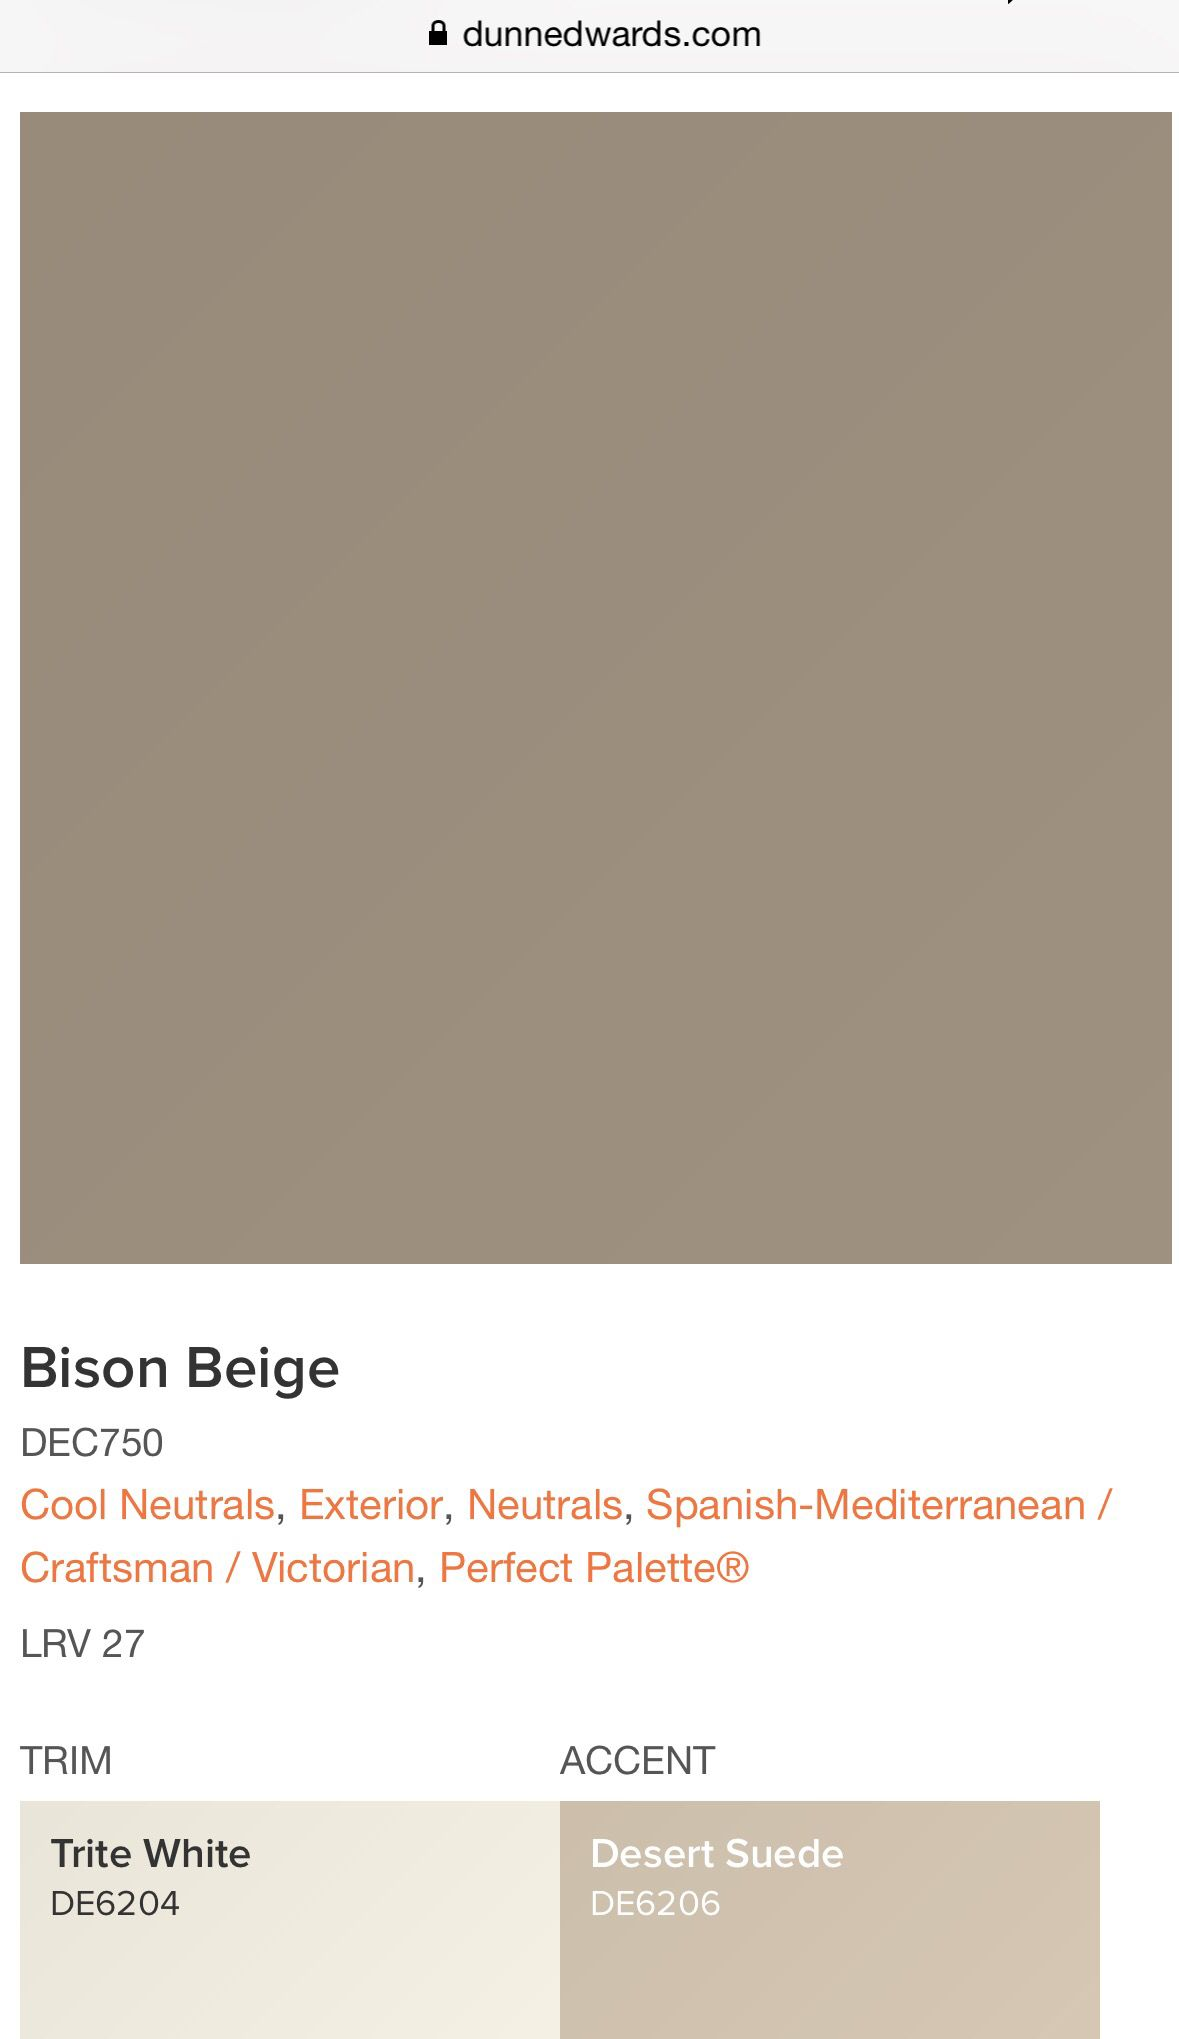 Dunn Edwards Exterior Paint Bison Beige Desert Suede Trite White Exterior Paint Colors For House Paint Colors For Home Outdoor House Paint